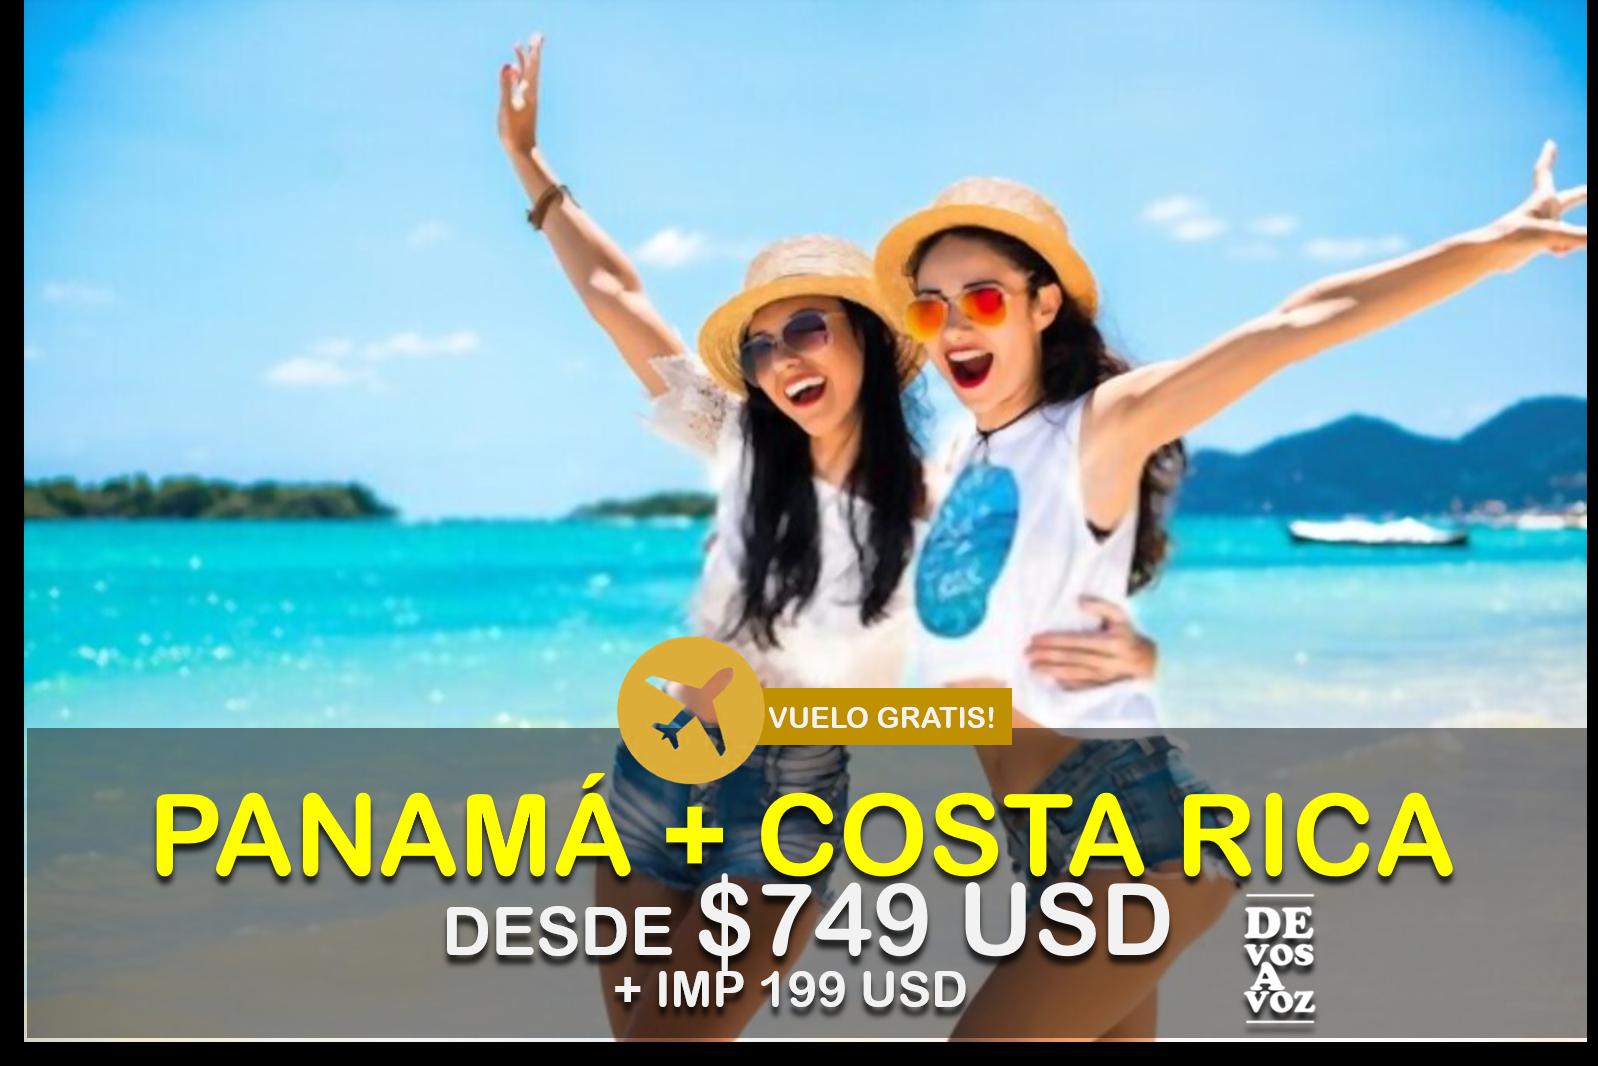 PANAMA + COSTA RICA